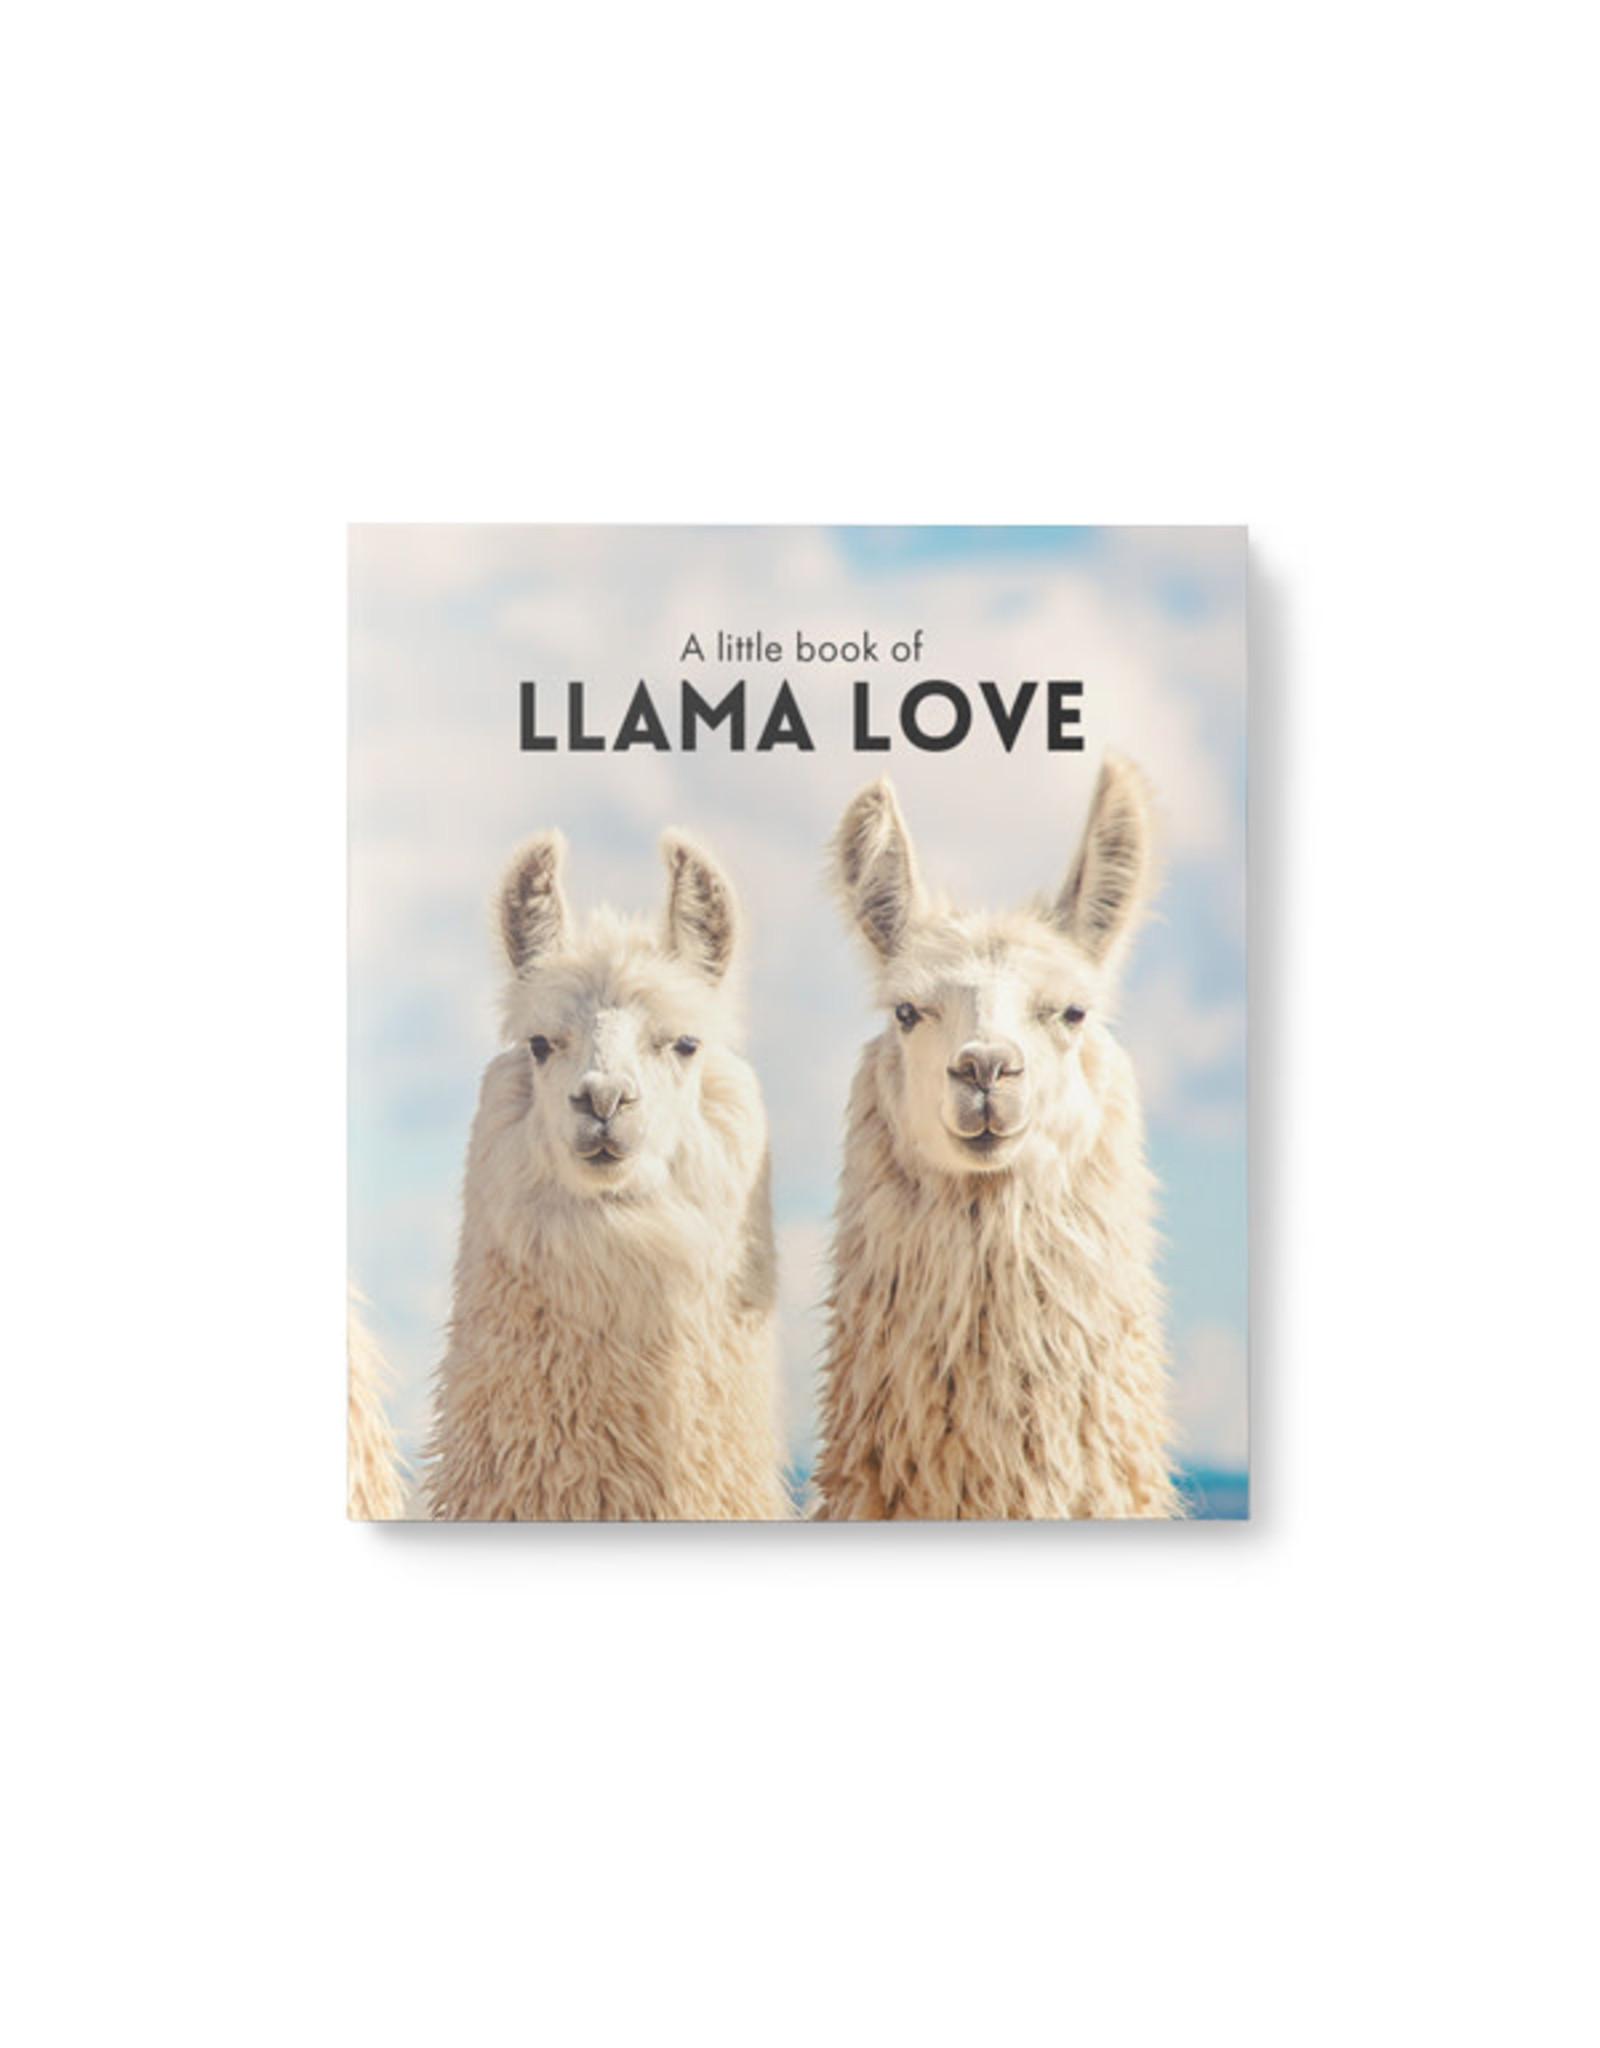 Little Book of Llama Love